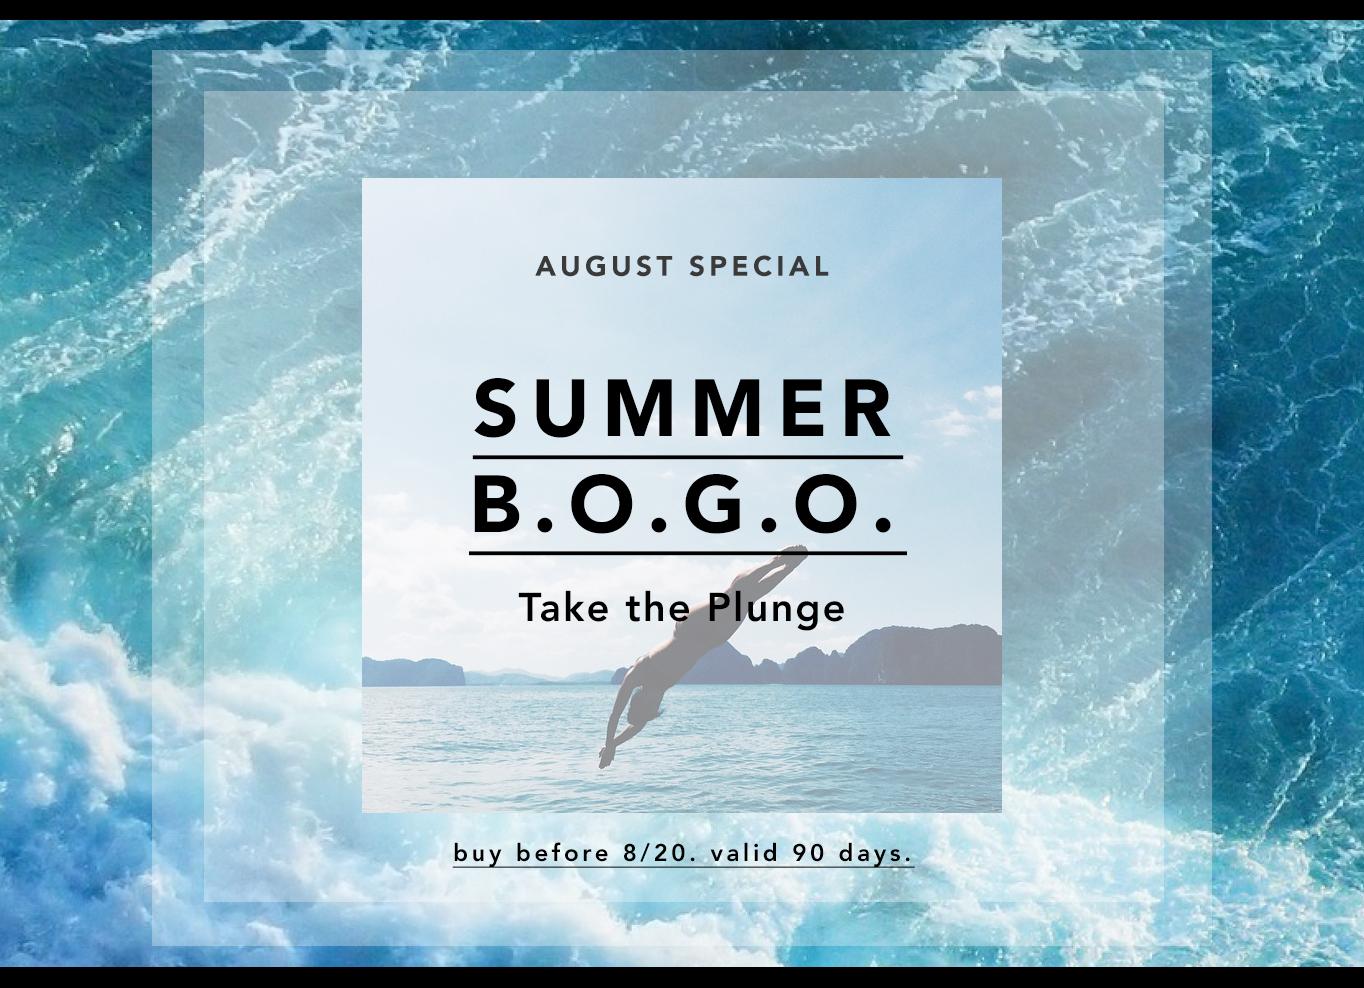 Summer Bogo.jpg